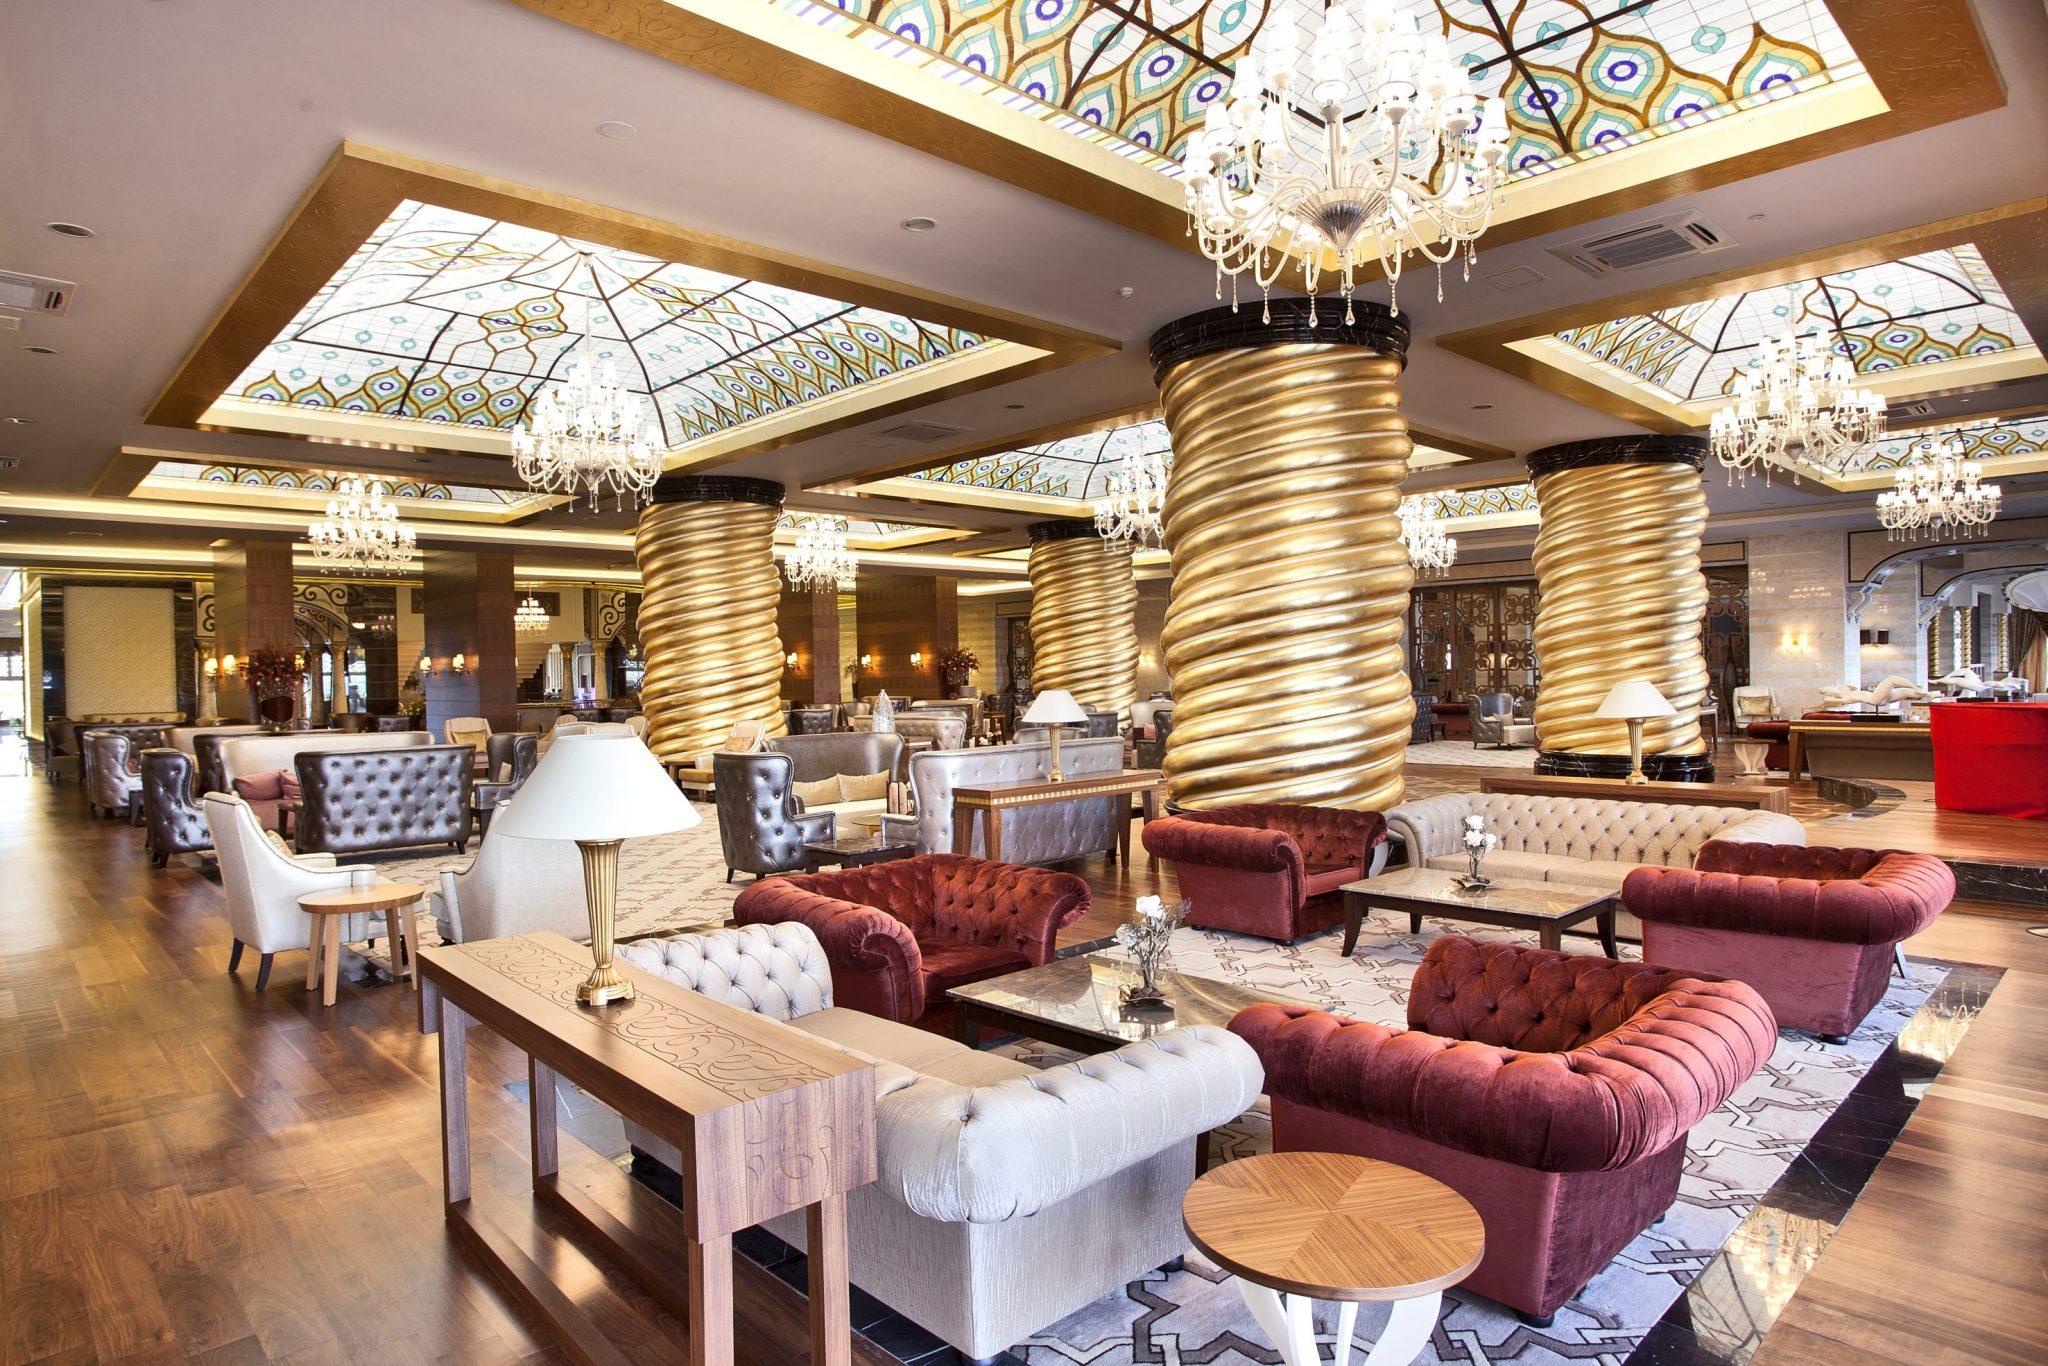 Letovanje_Turska_Hoteli_Avio_Antalija_Hotel_Royal_Holiday_Palace-24-scaled.jpg